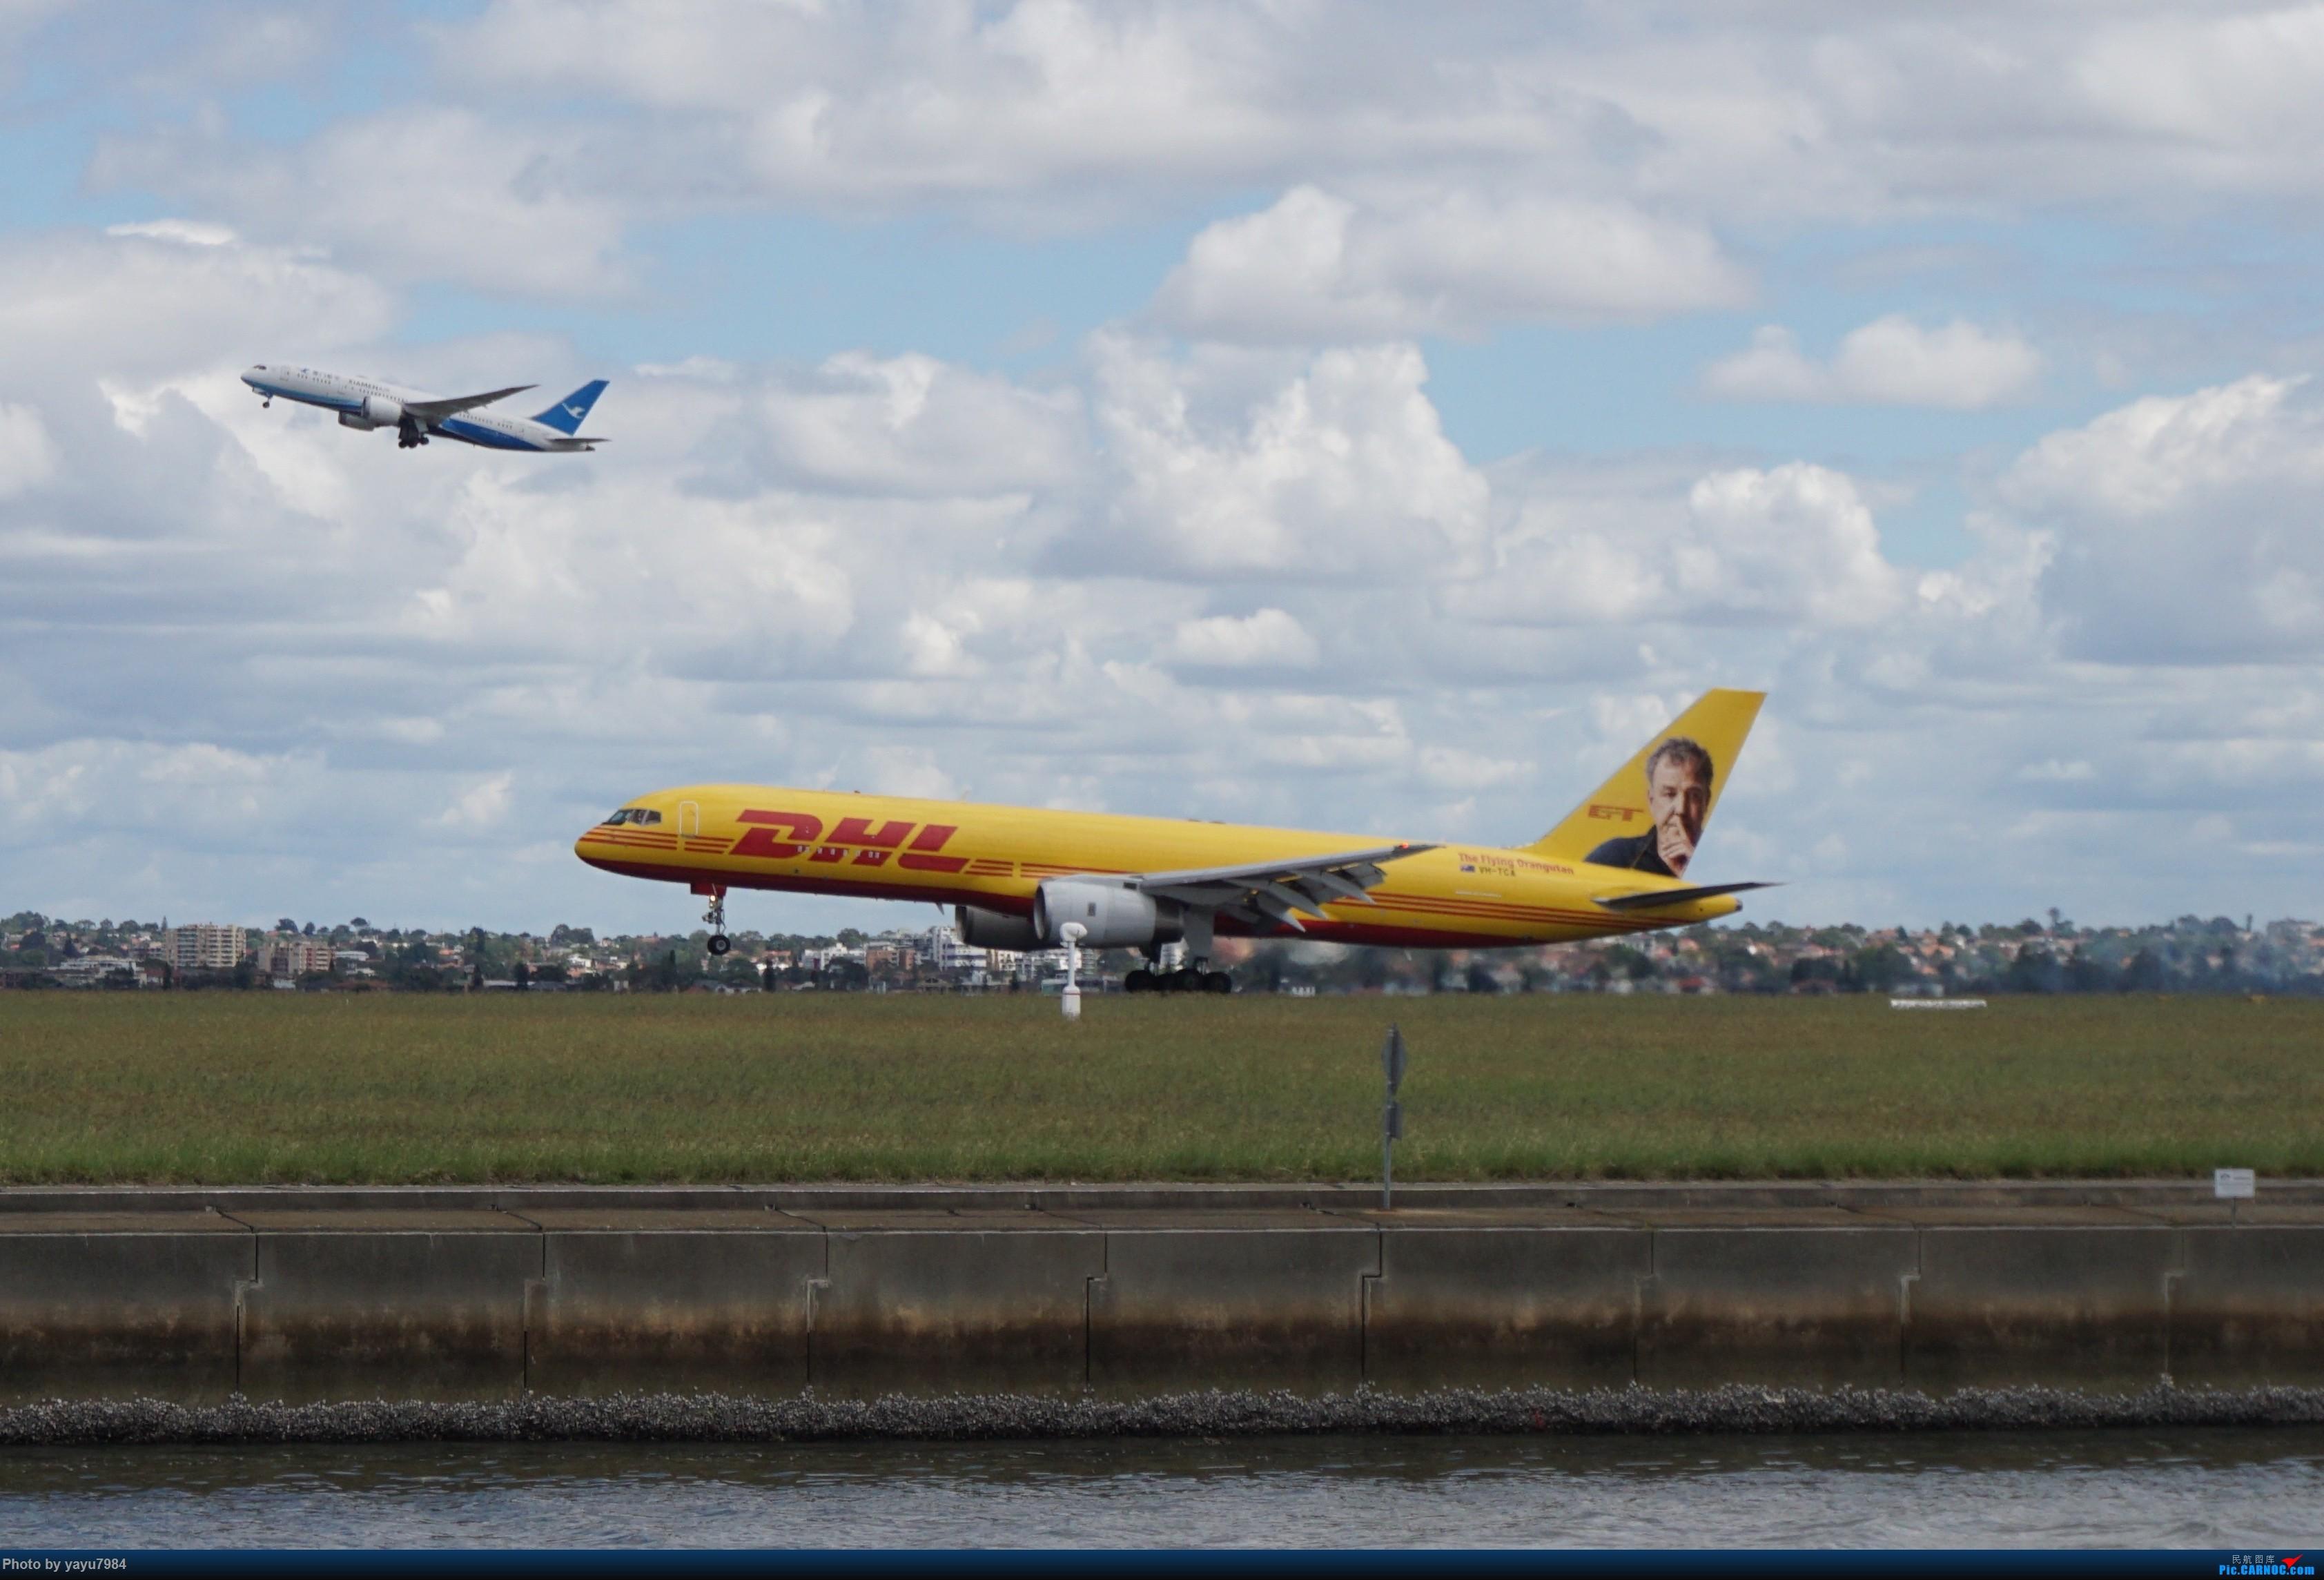 Re:[原创][SYD] 开帖分享一下16L/34R,以及07/25跑道周边的新拍机点位 BOEING 757-200 VH-TCA 澳大利亚悉尼金斯福德·史密斯机场